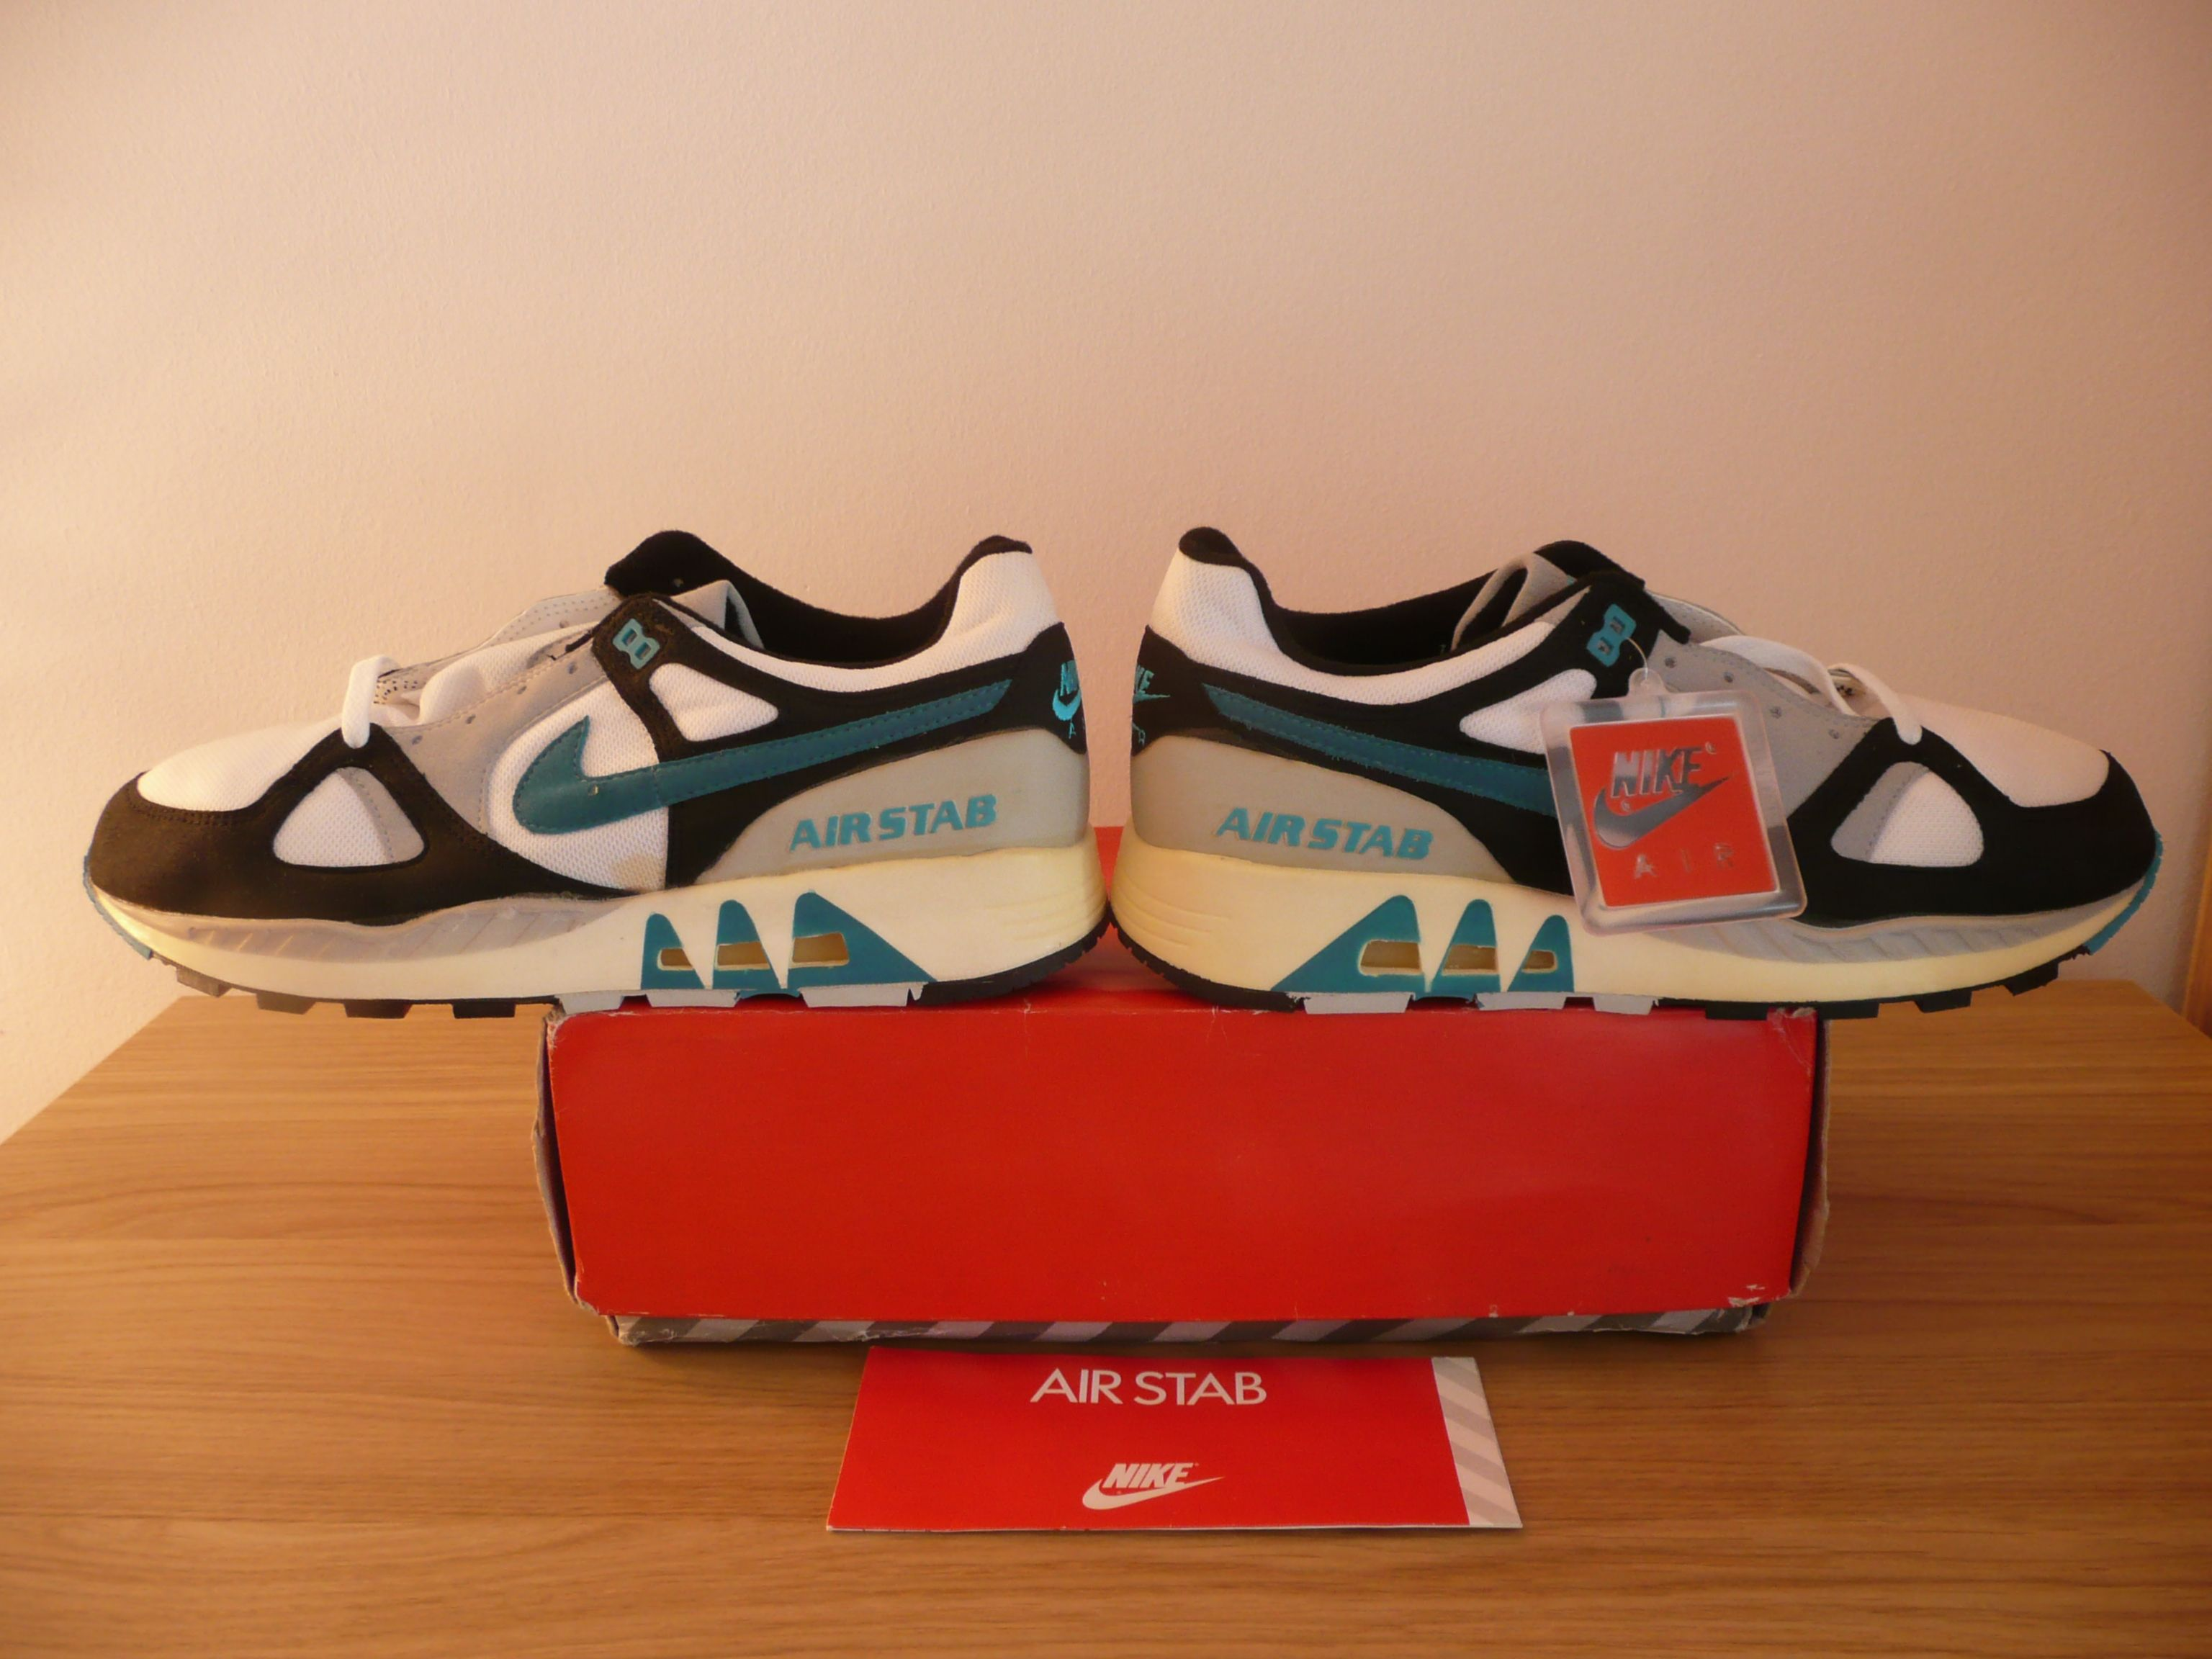 OG Nike Air Stab (Still bouncy foam!) | Nike air shoes